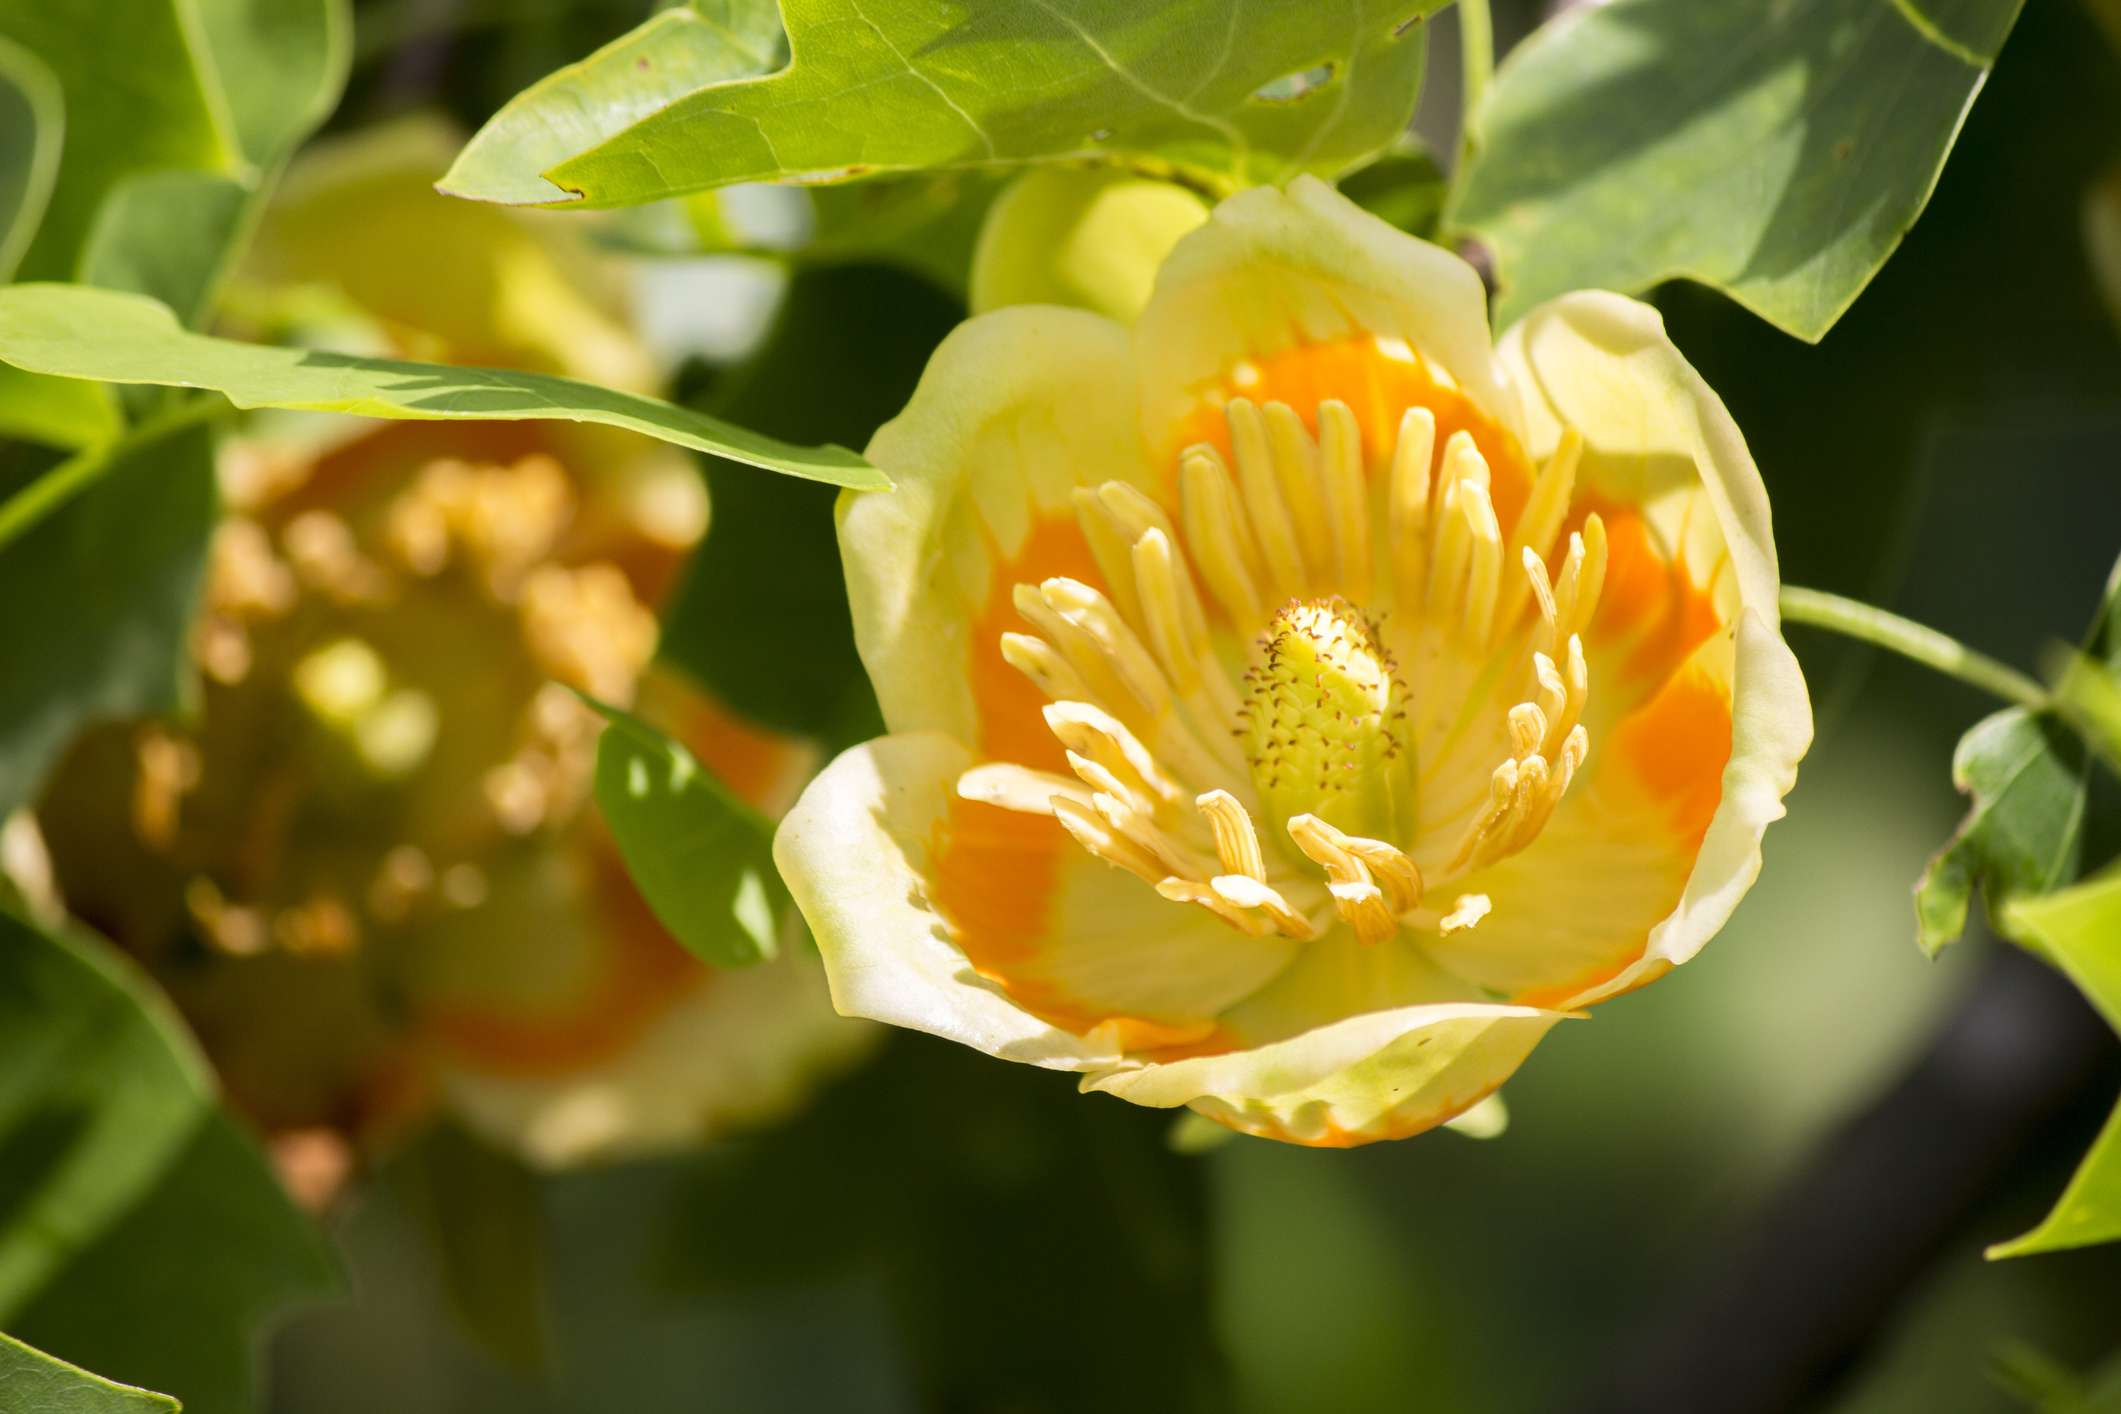 Tulip poplar tree with yellow and orange flower on branch closeup